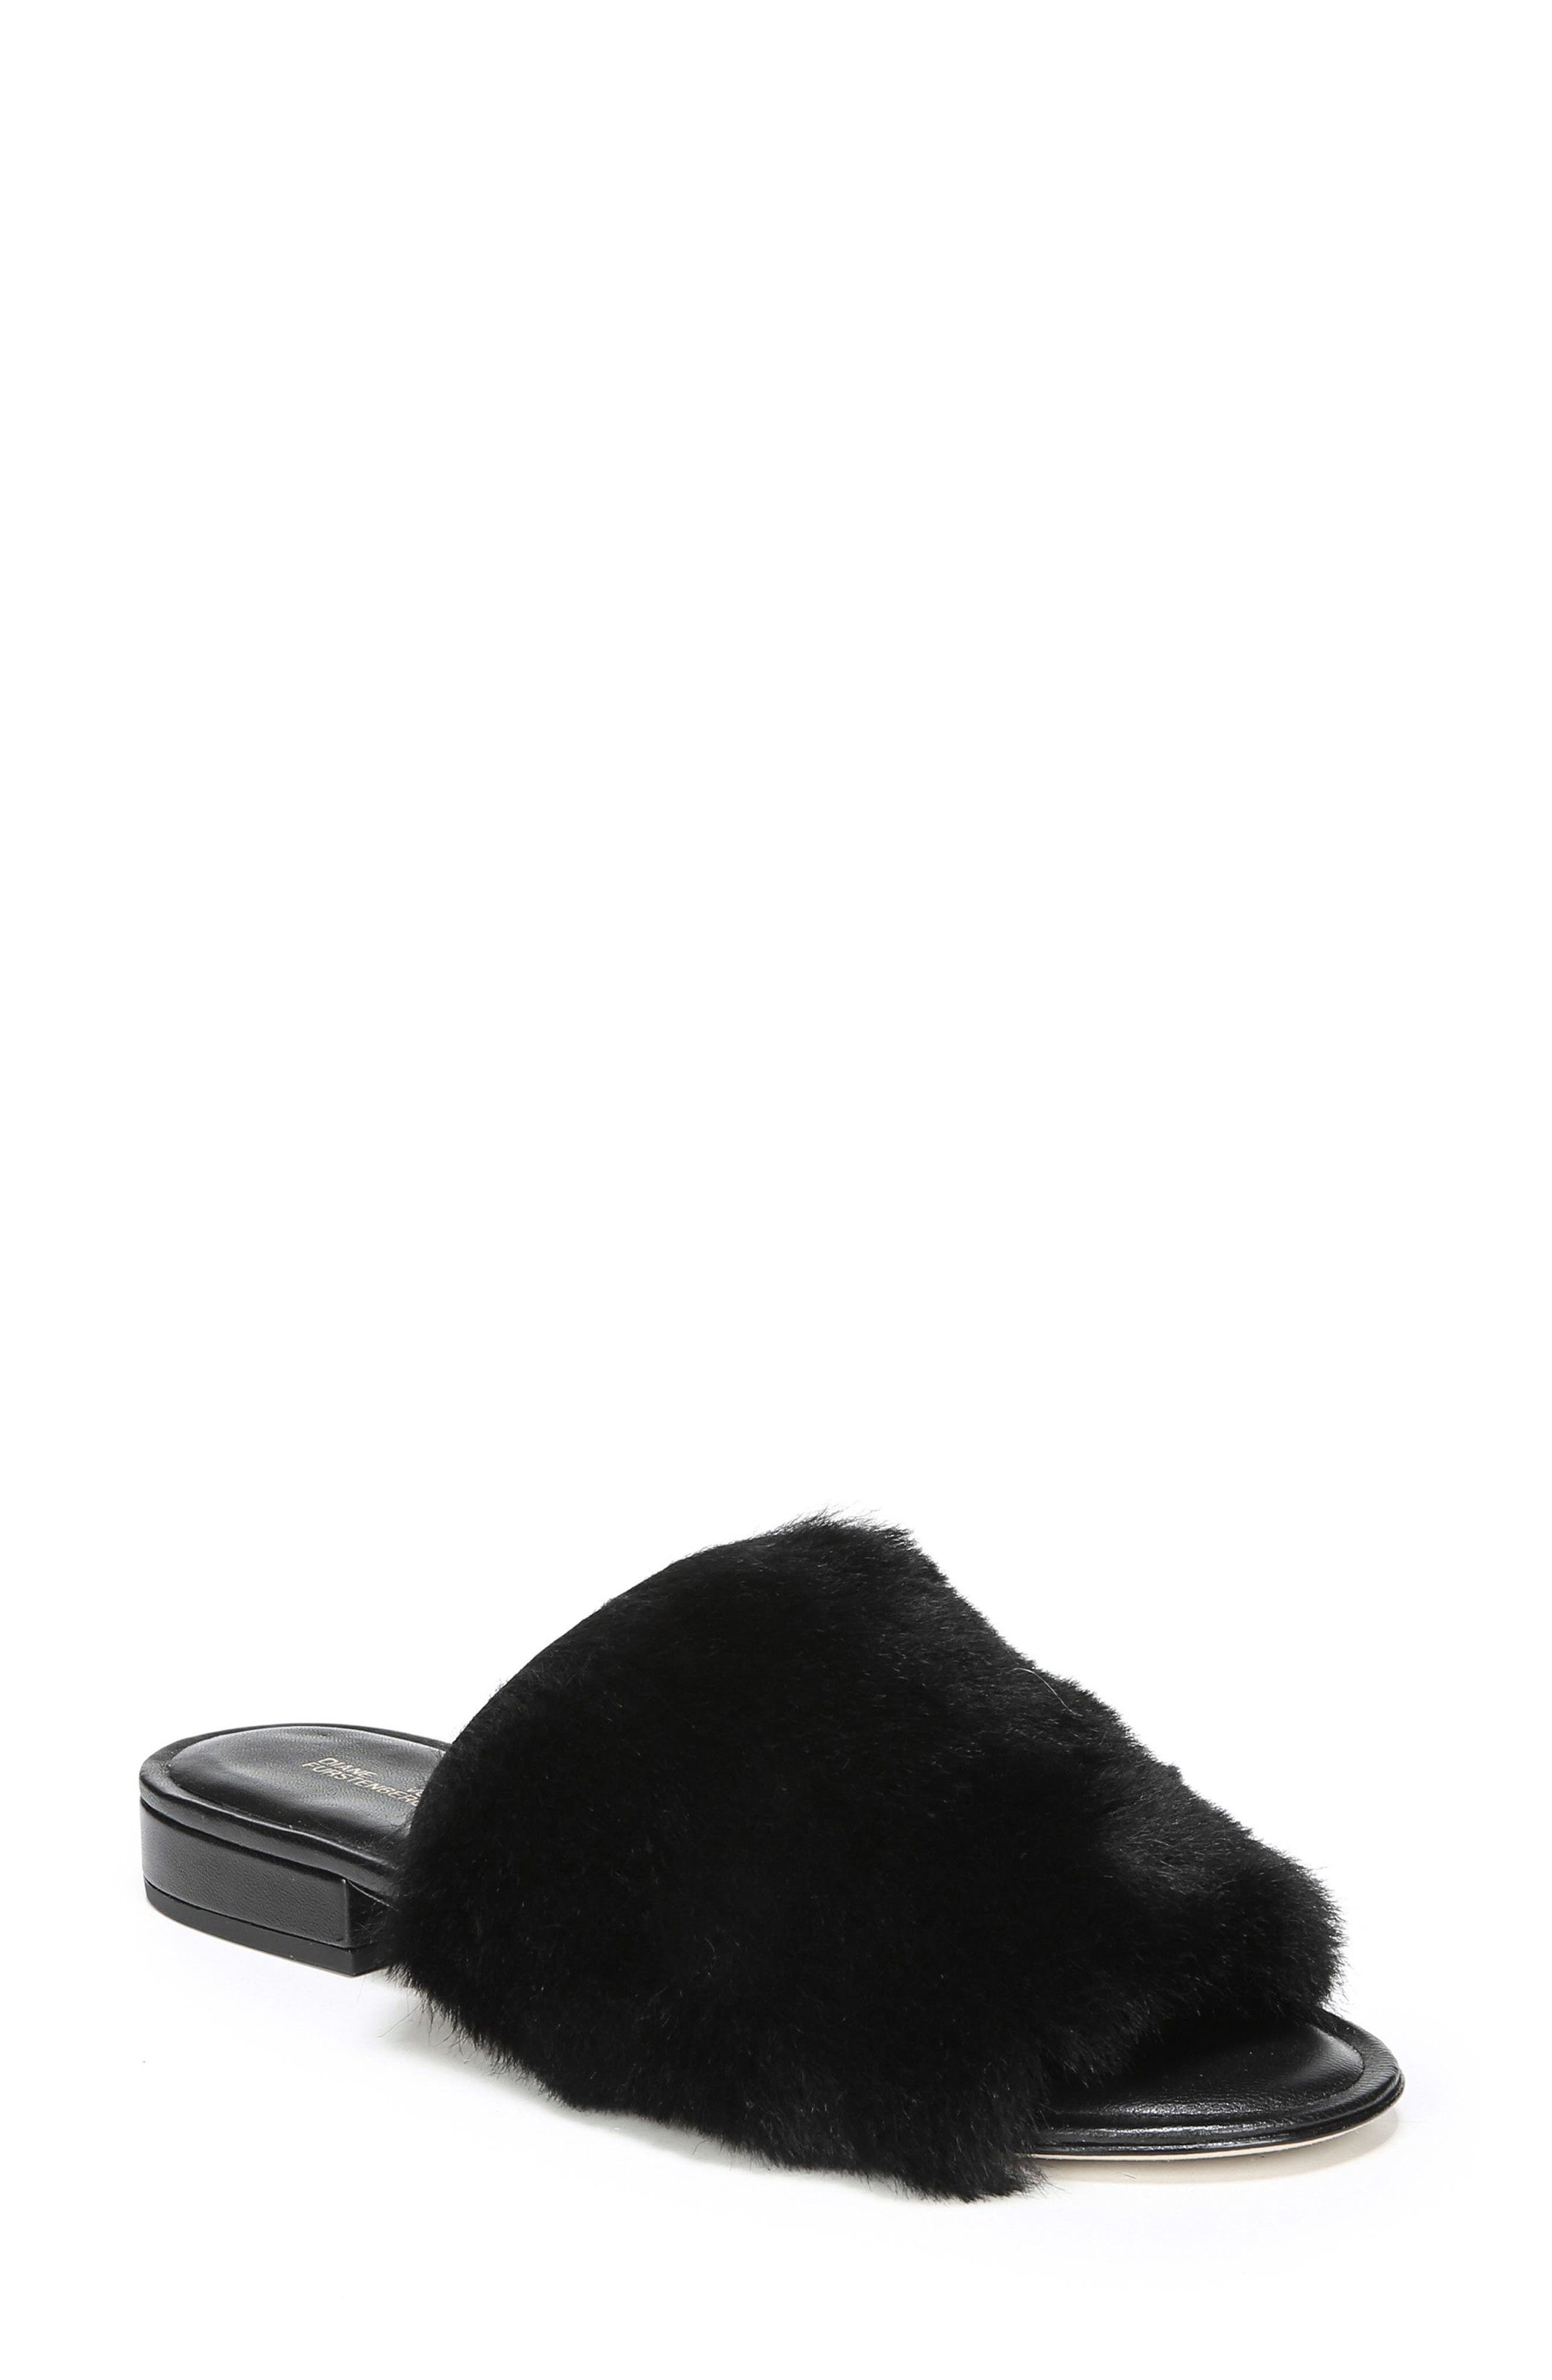 Main Image - Diane von Furstenberg Santi Genuine Shearling Slide Sandal (Women)